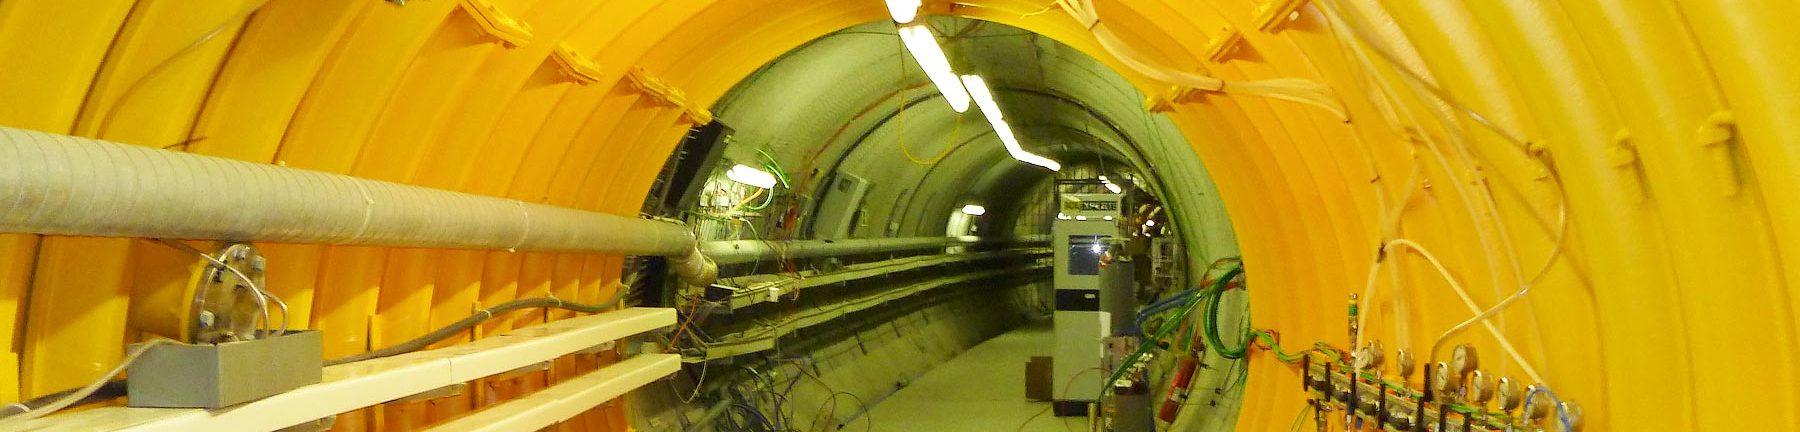 MCM radioactive waste disposal experts